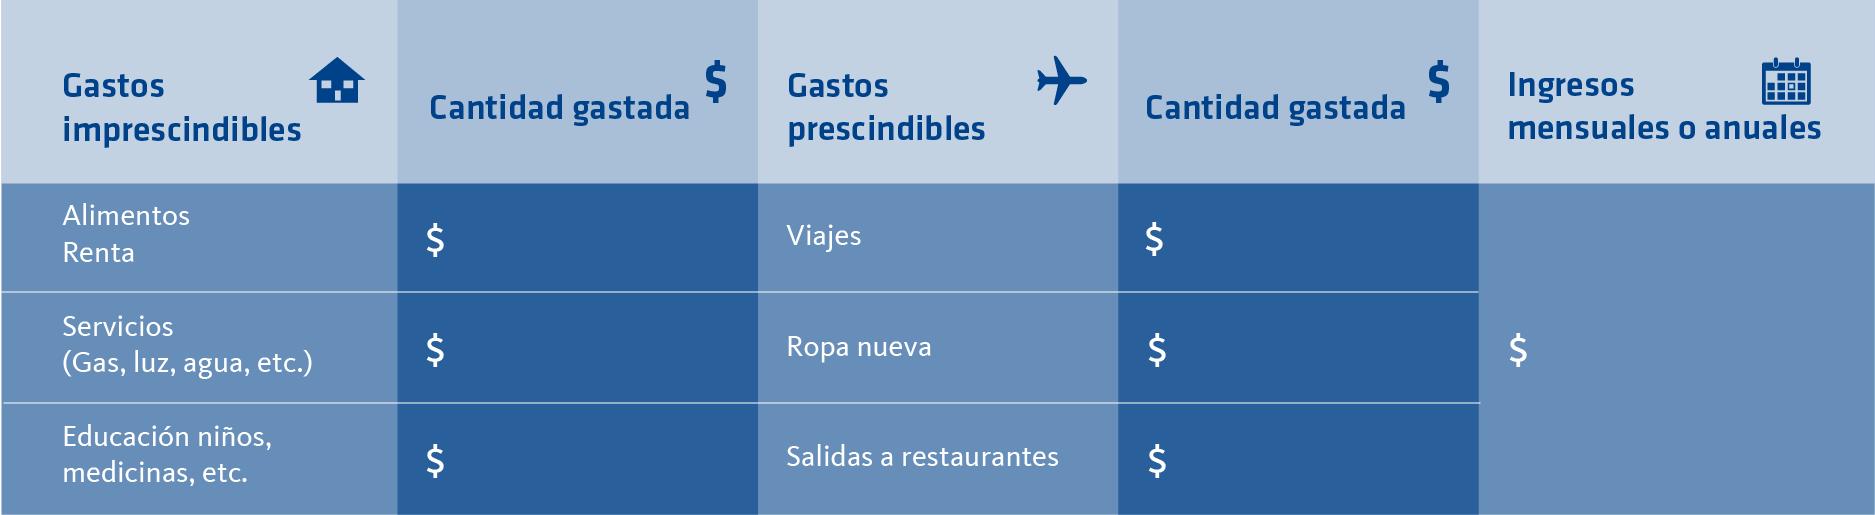 tabla-presupuesto